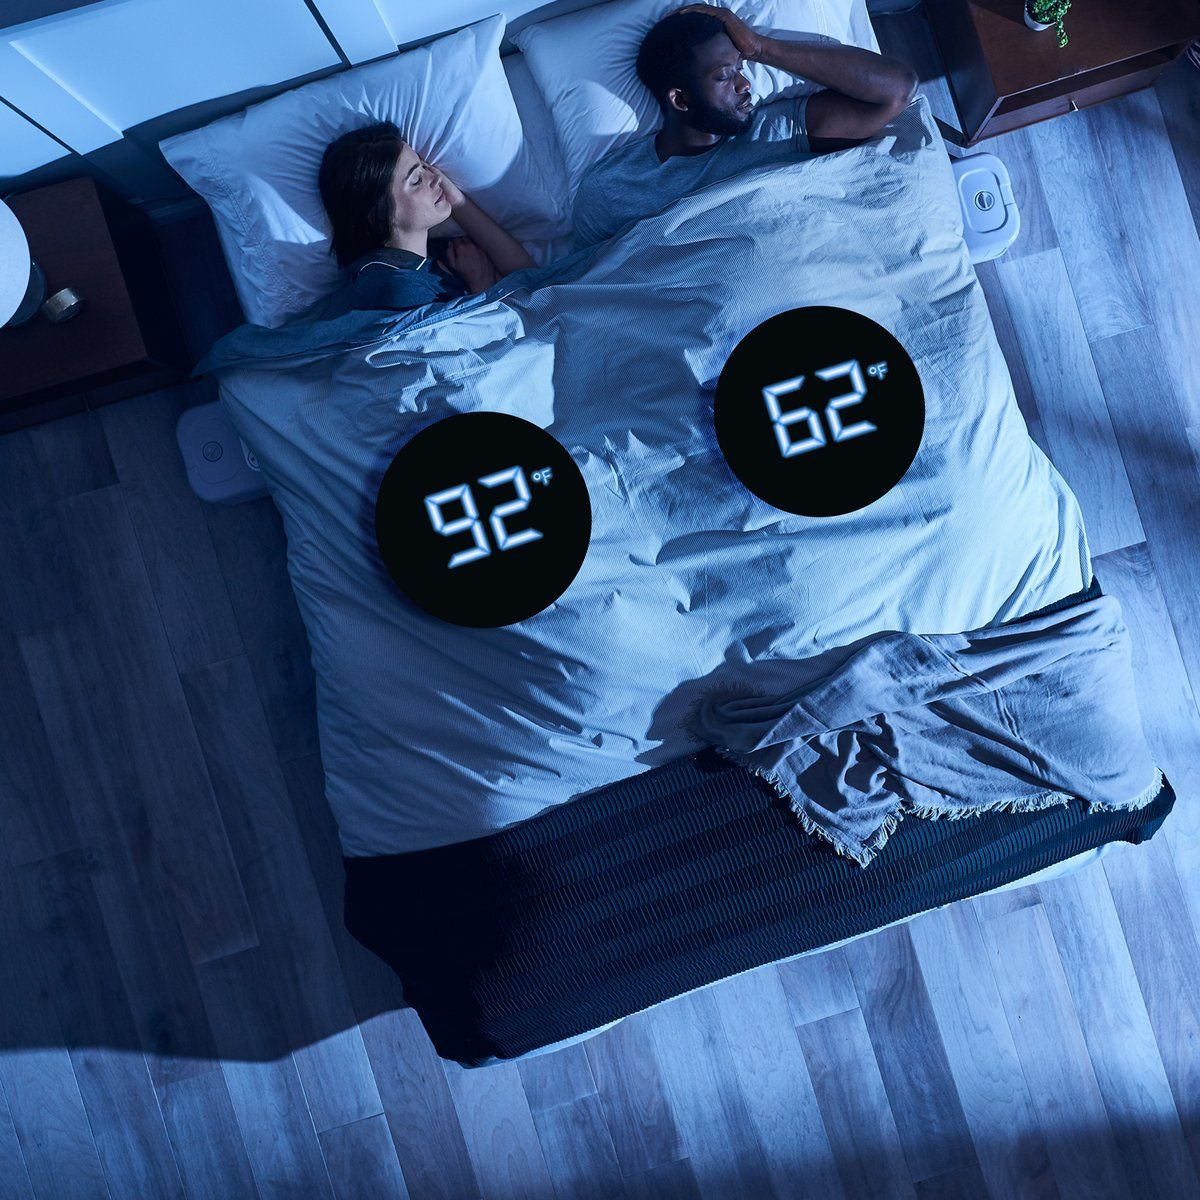 chiliPAD Sleep System The 1 Reviewed Mattress Pad